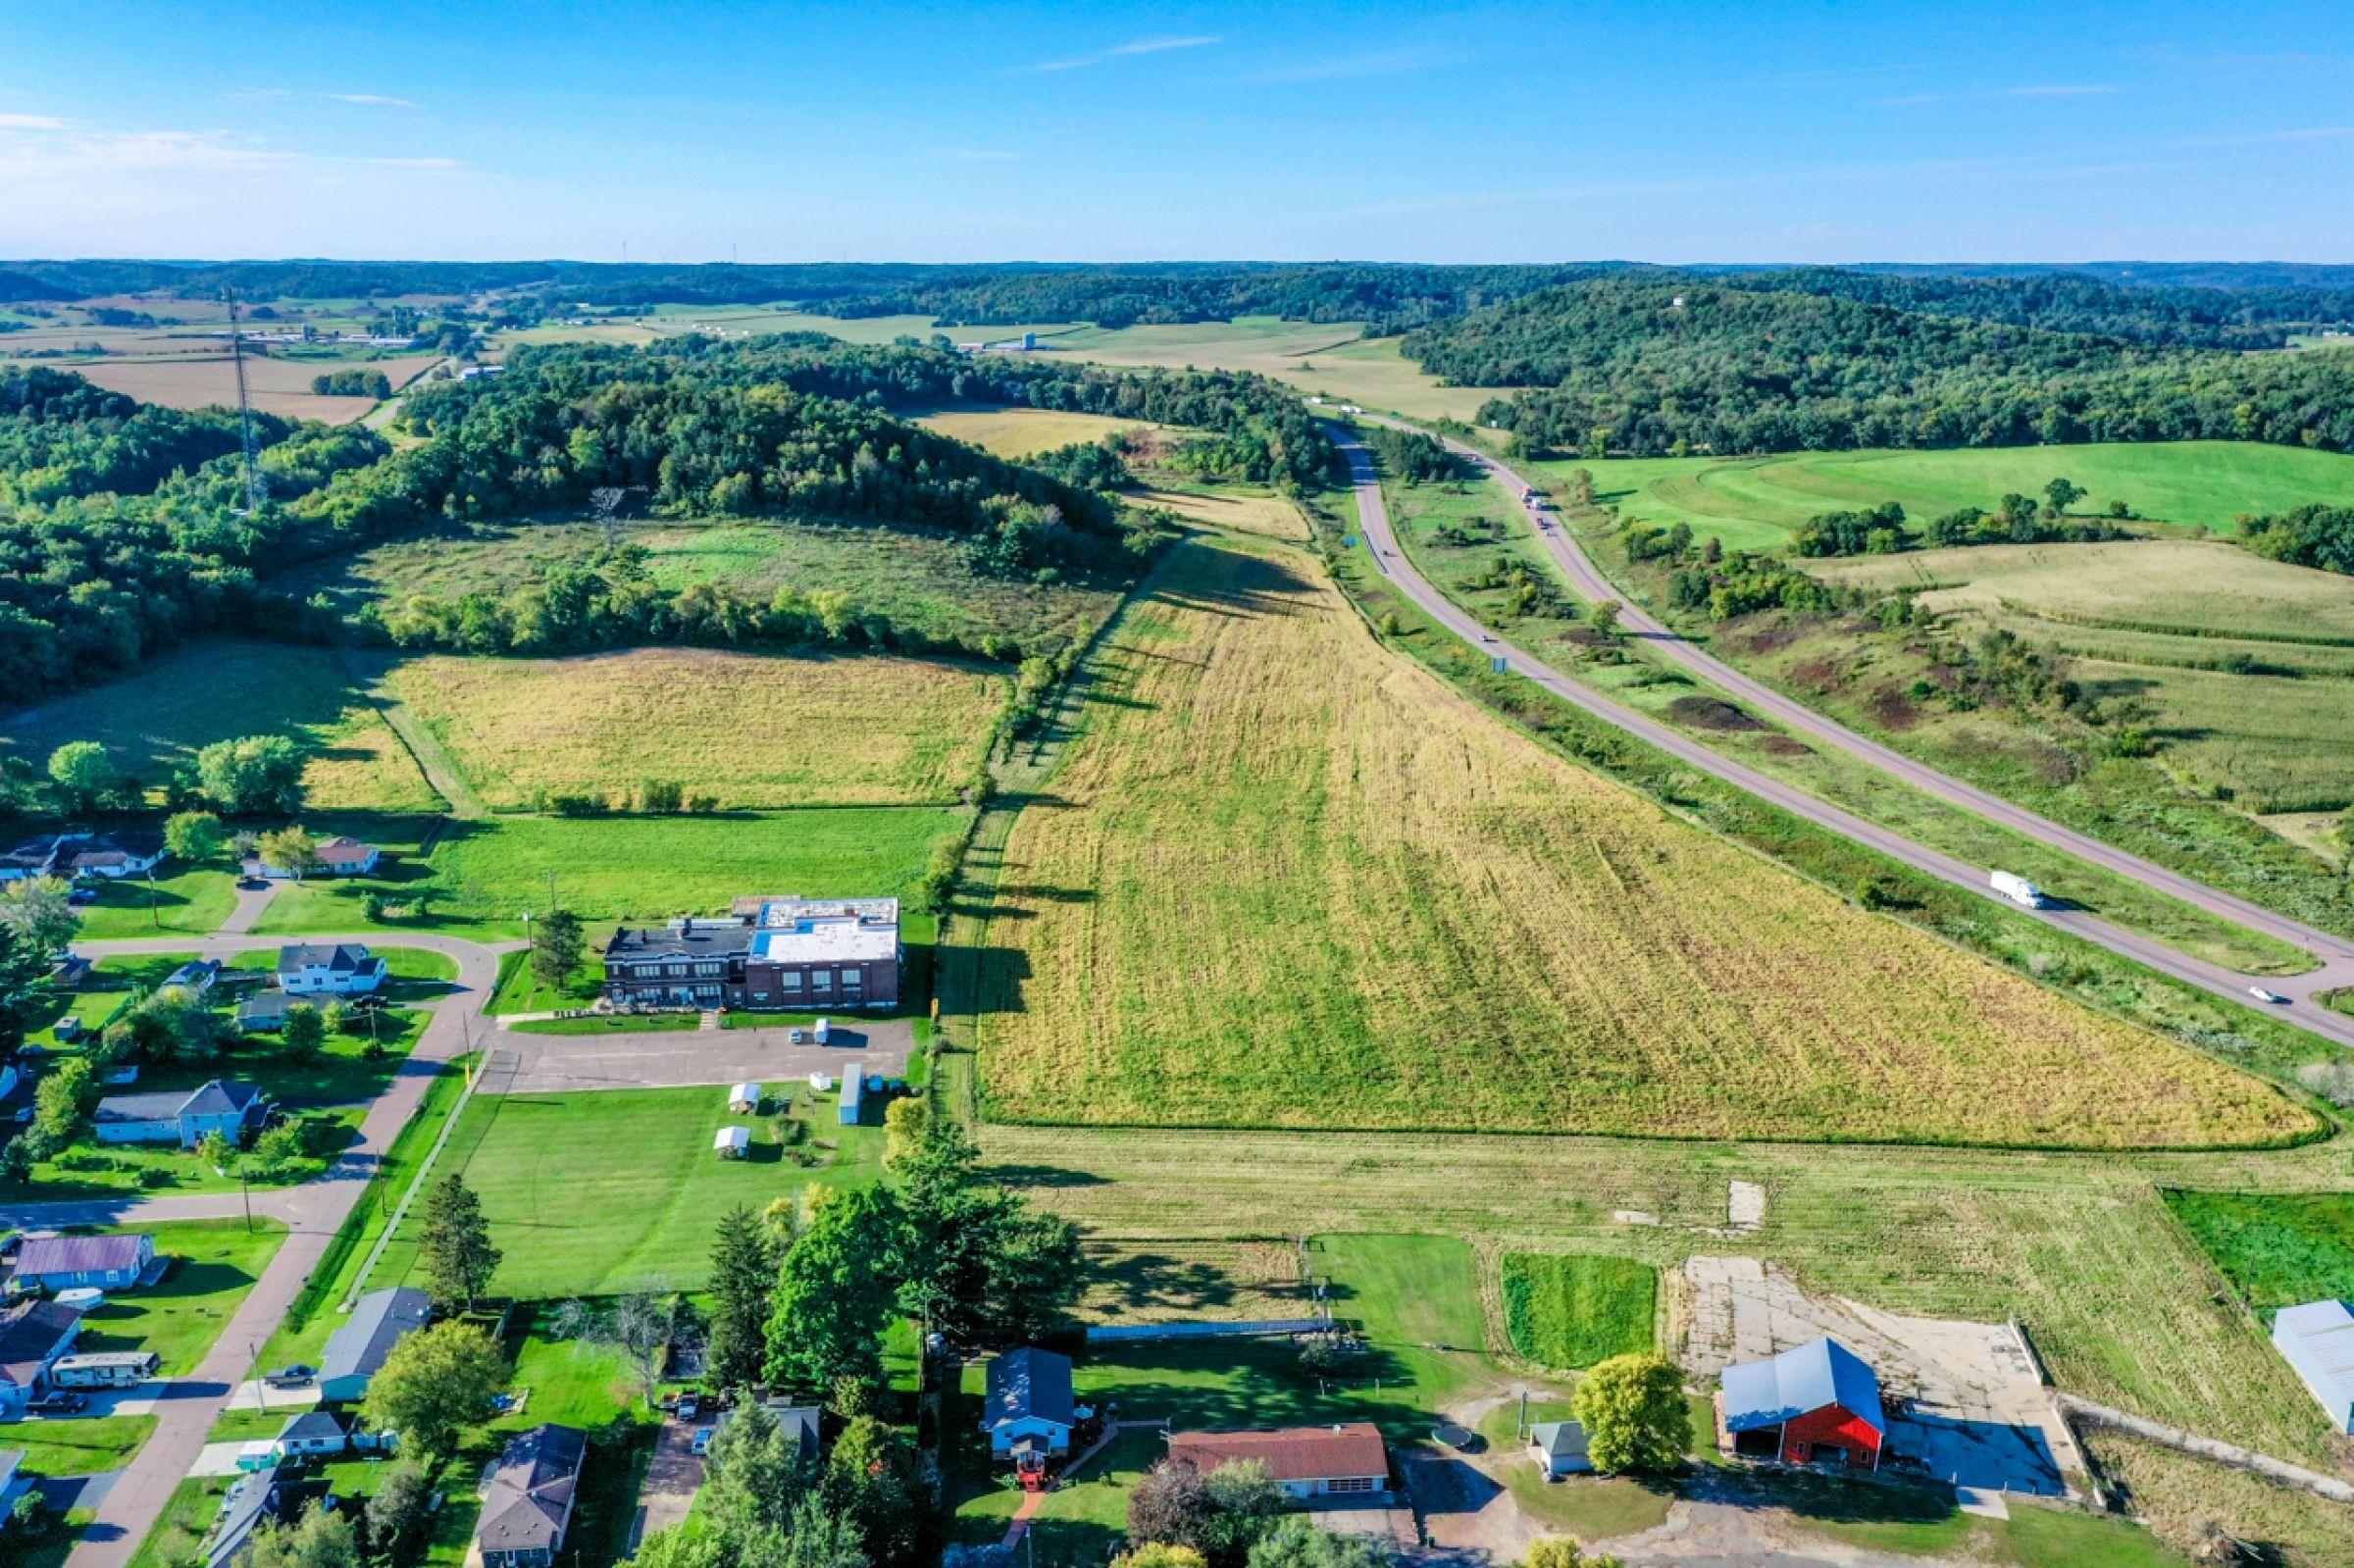 2-4449-acres-ml-3rd-street-hixton-54635-3-2021-09-16-164756.jpg